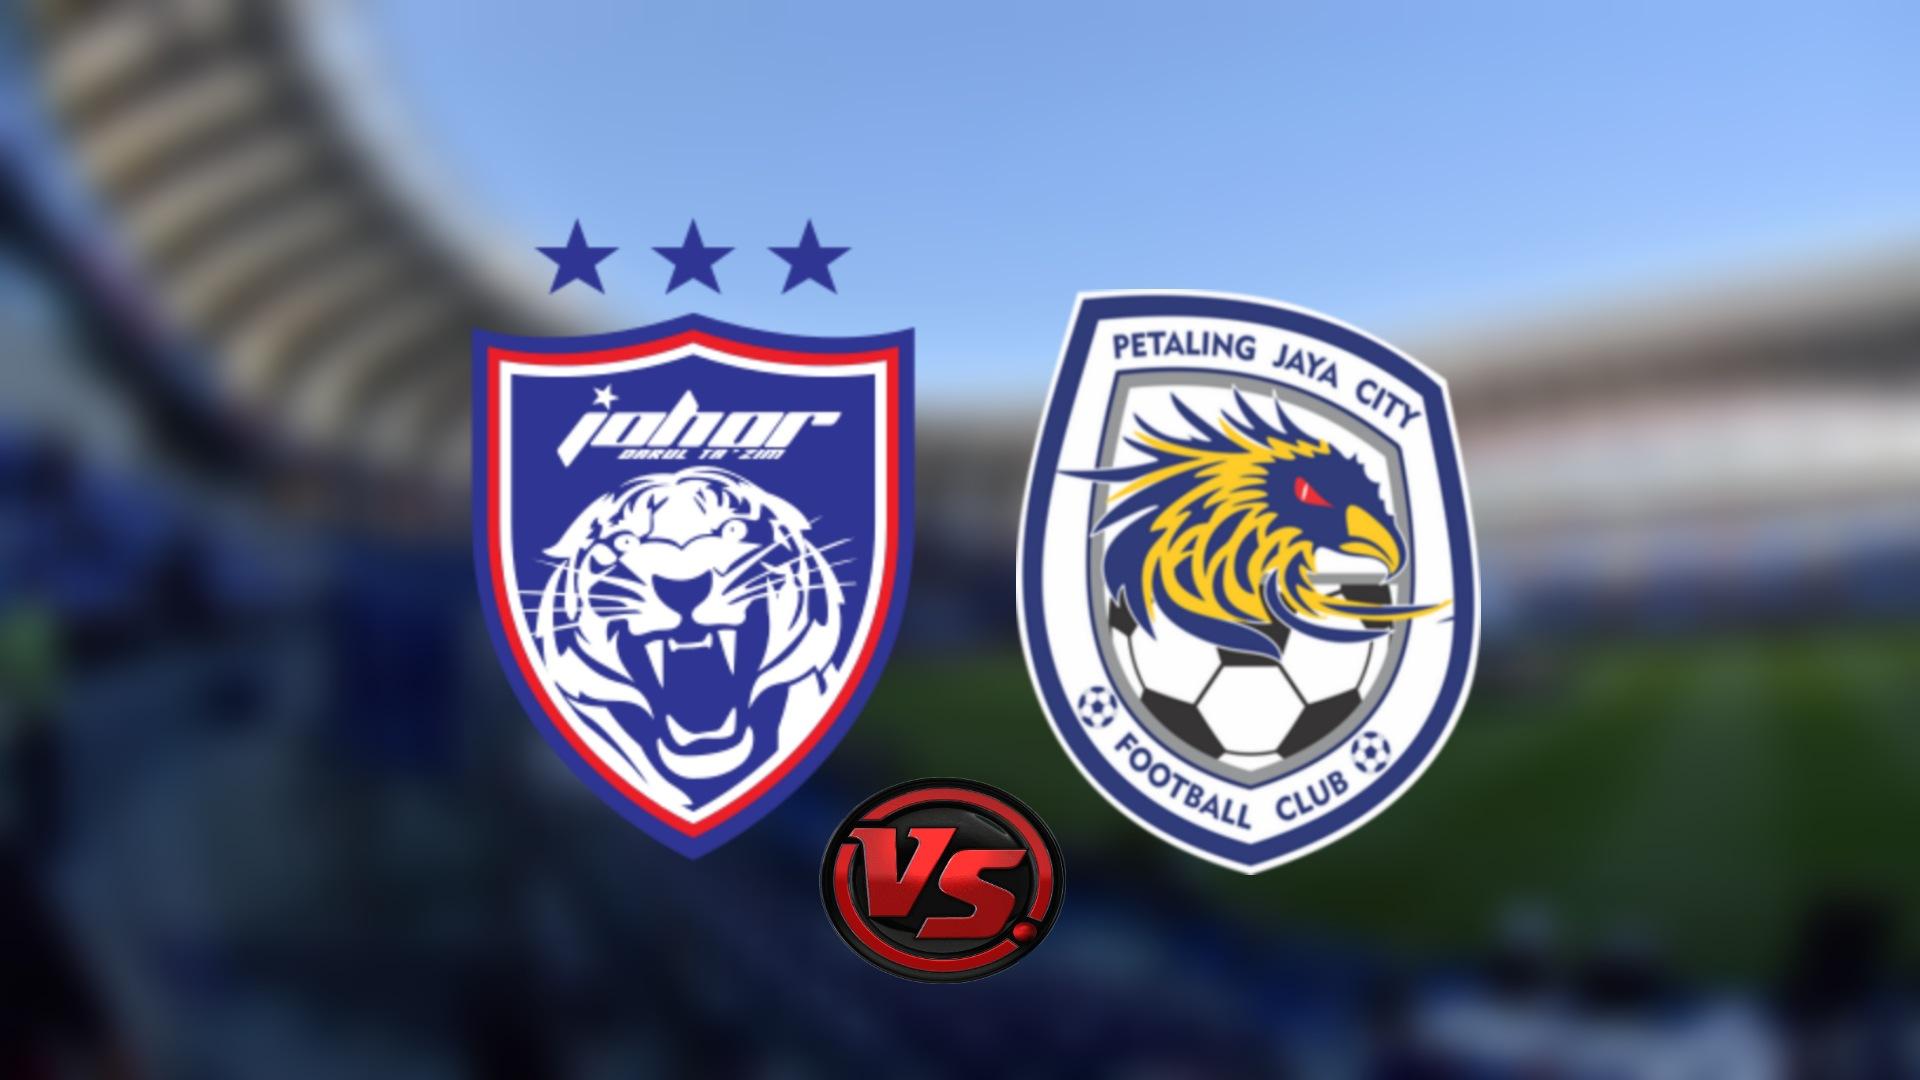 Live Streaming JDT FC vs PJ City FC Piala Malaysia 30.9.2021